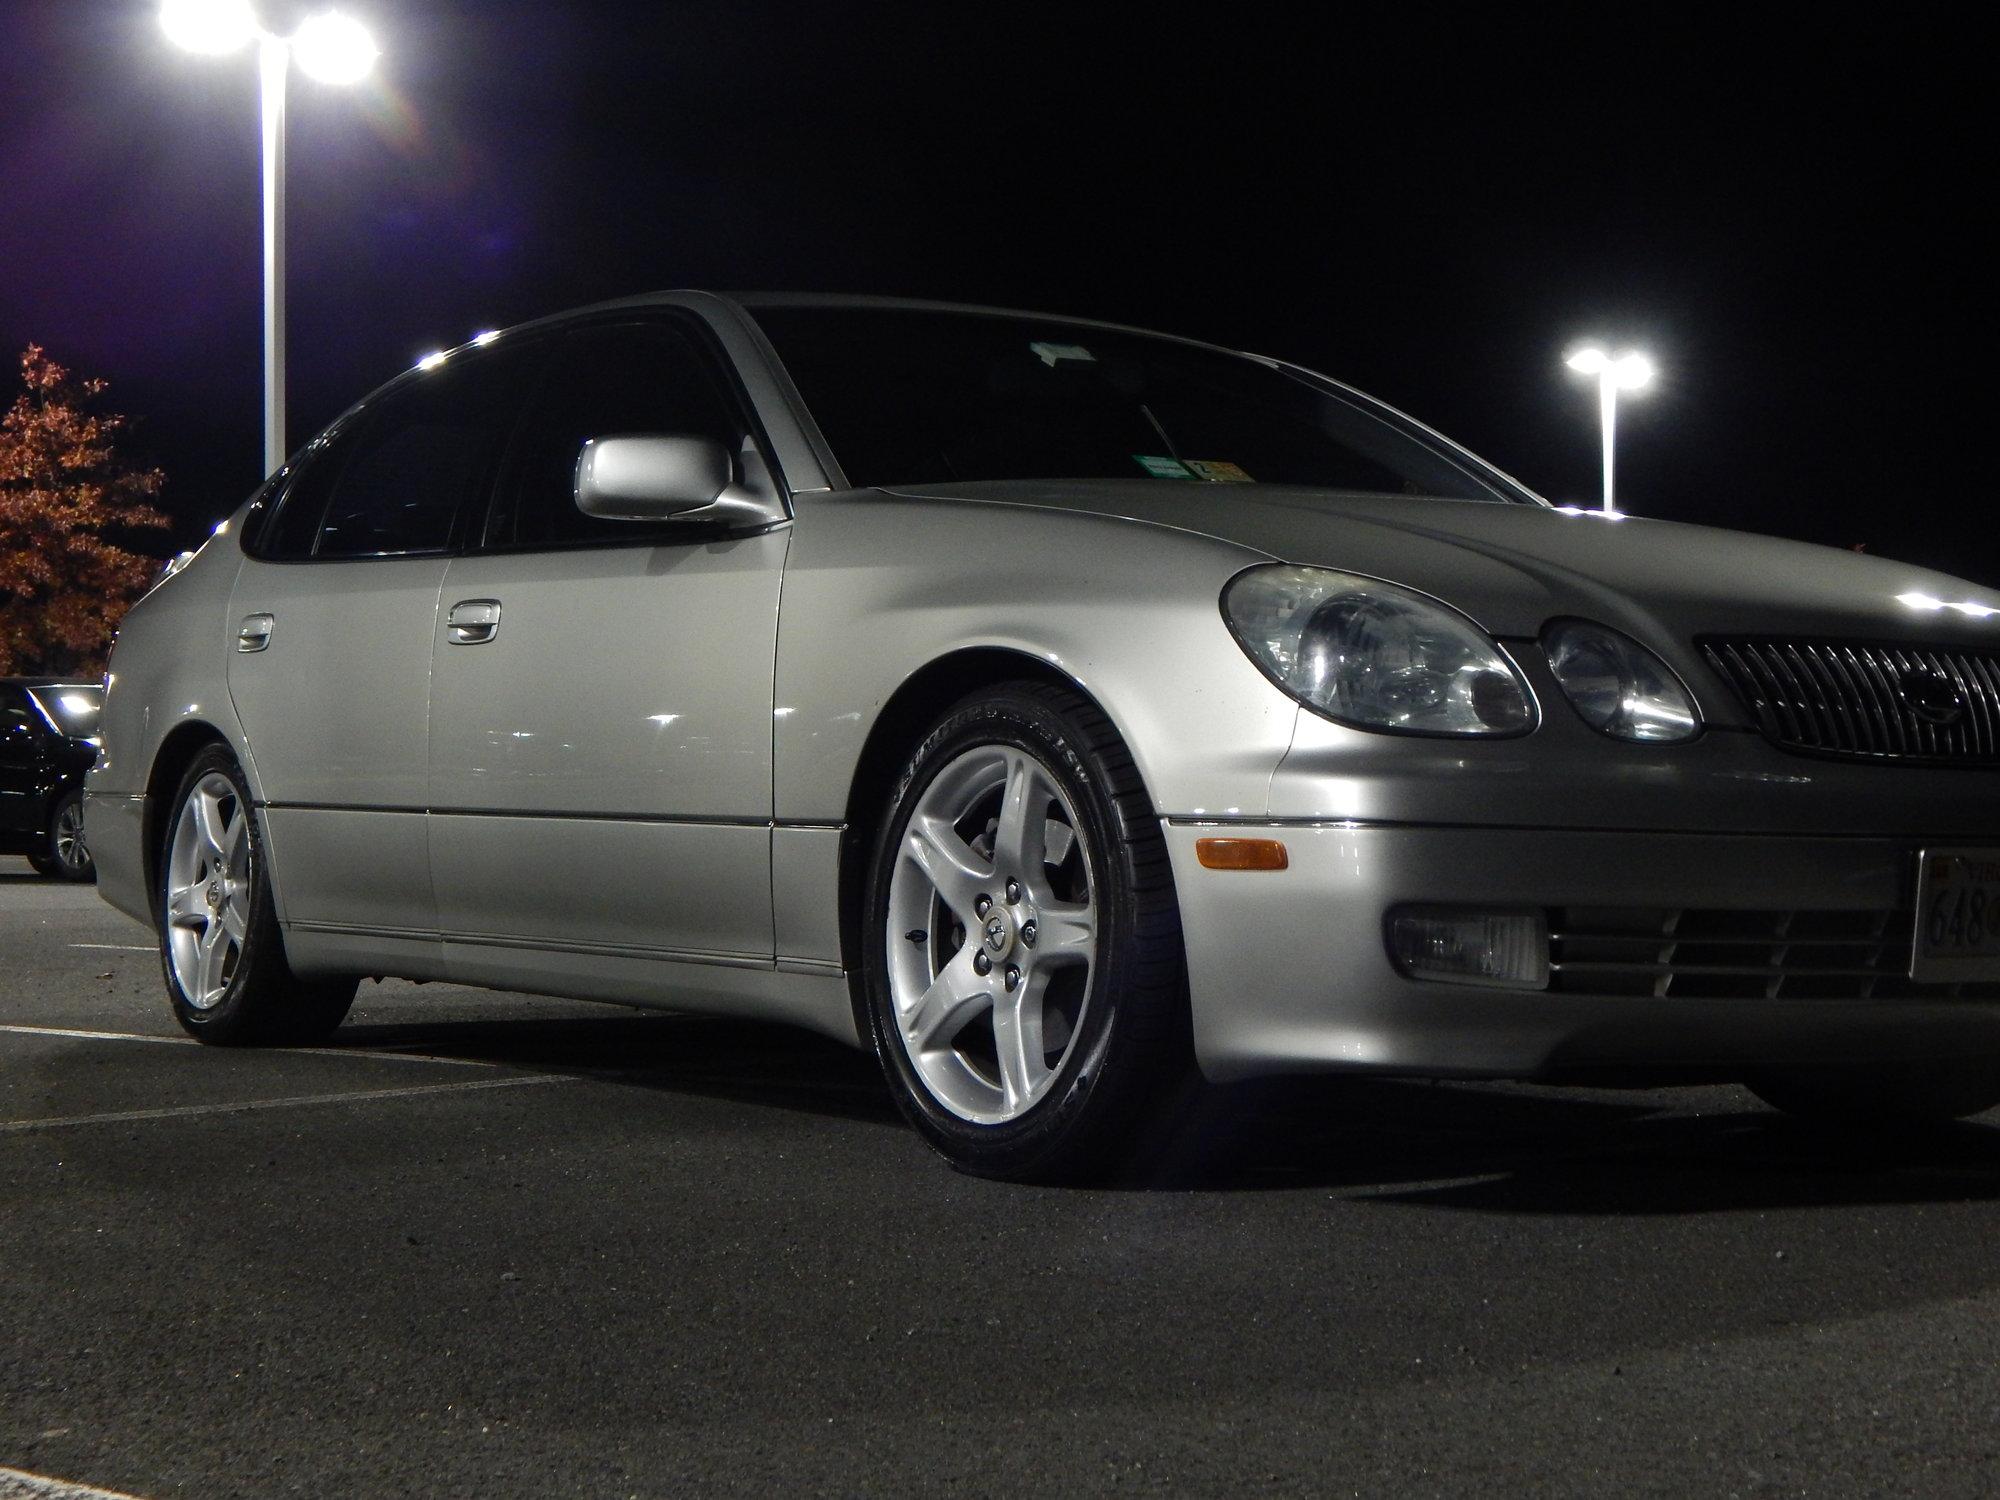 va 2001 gs430 millennium silver over black 1635k miles light mods